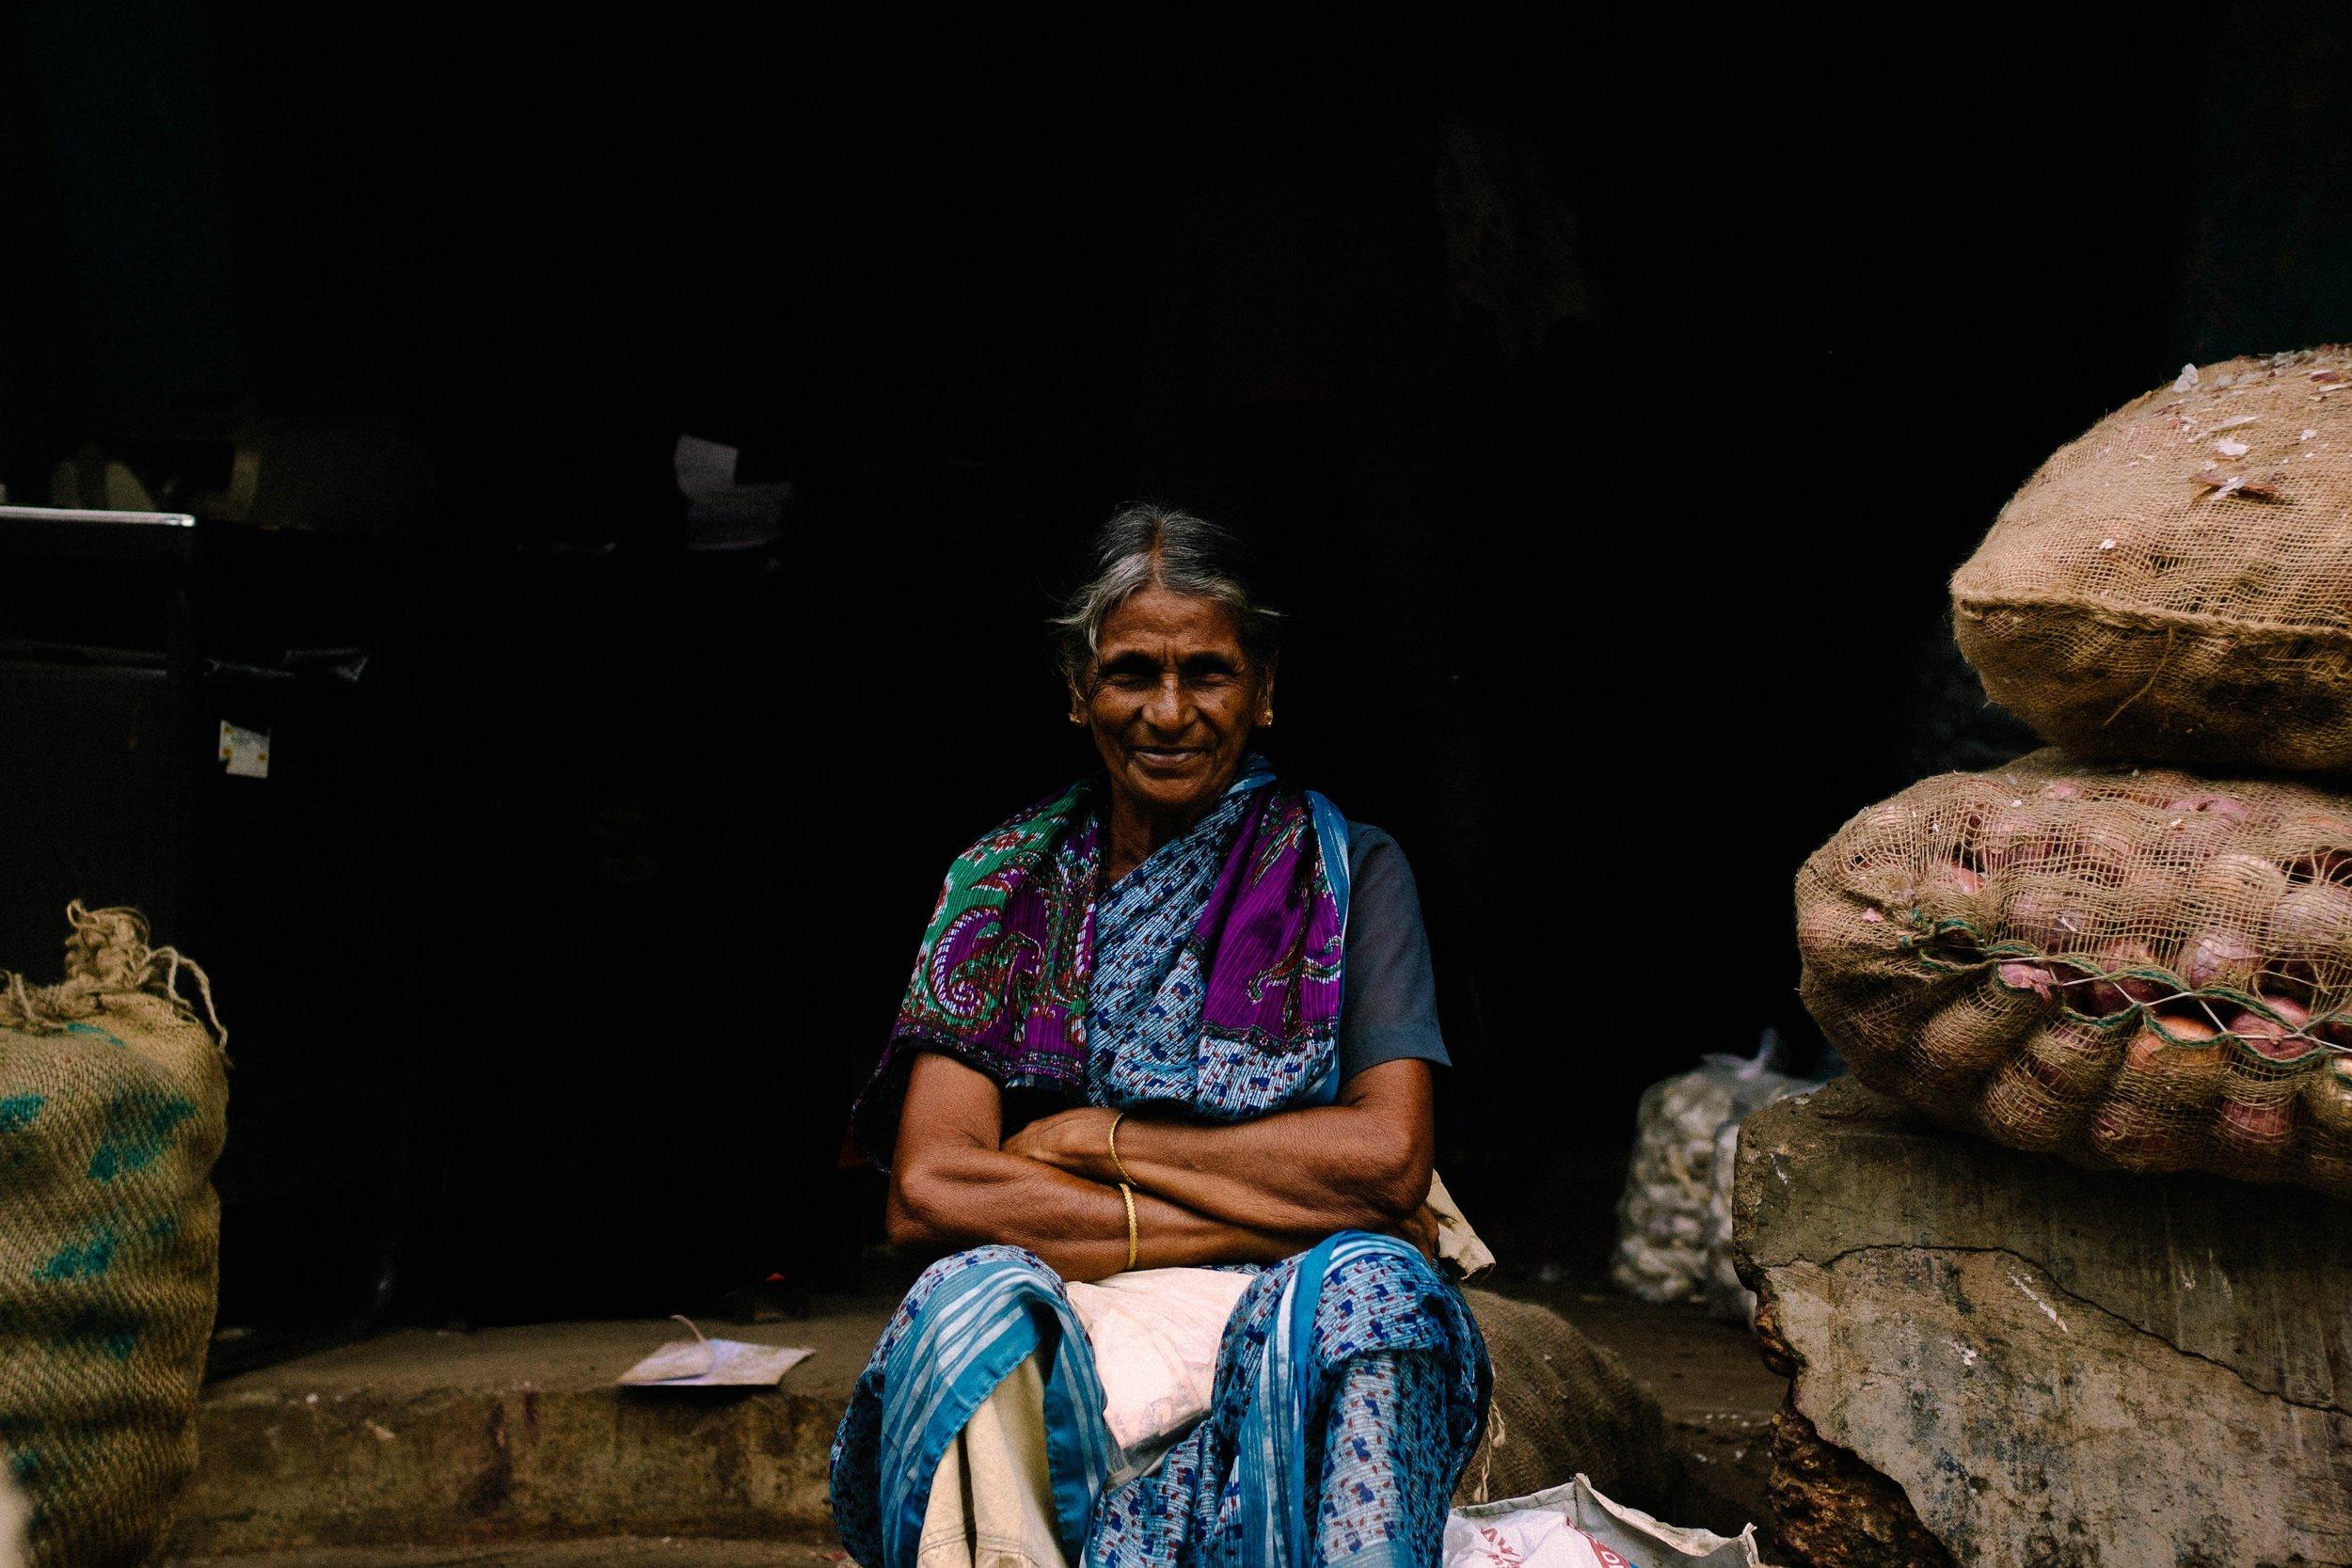 aman-bhargava-268332-unsplash.jpg